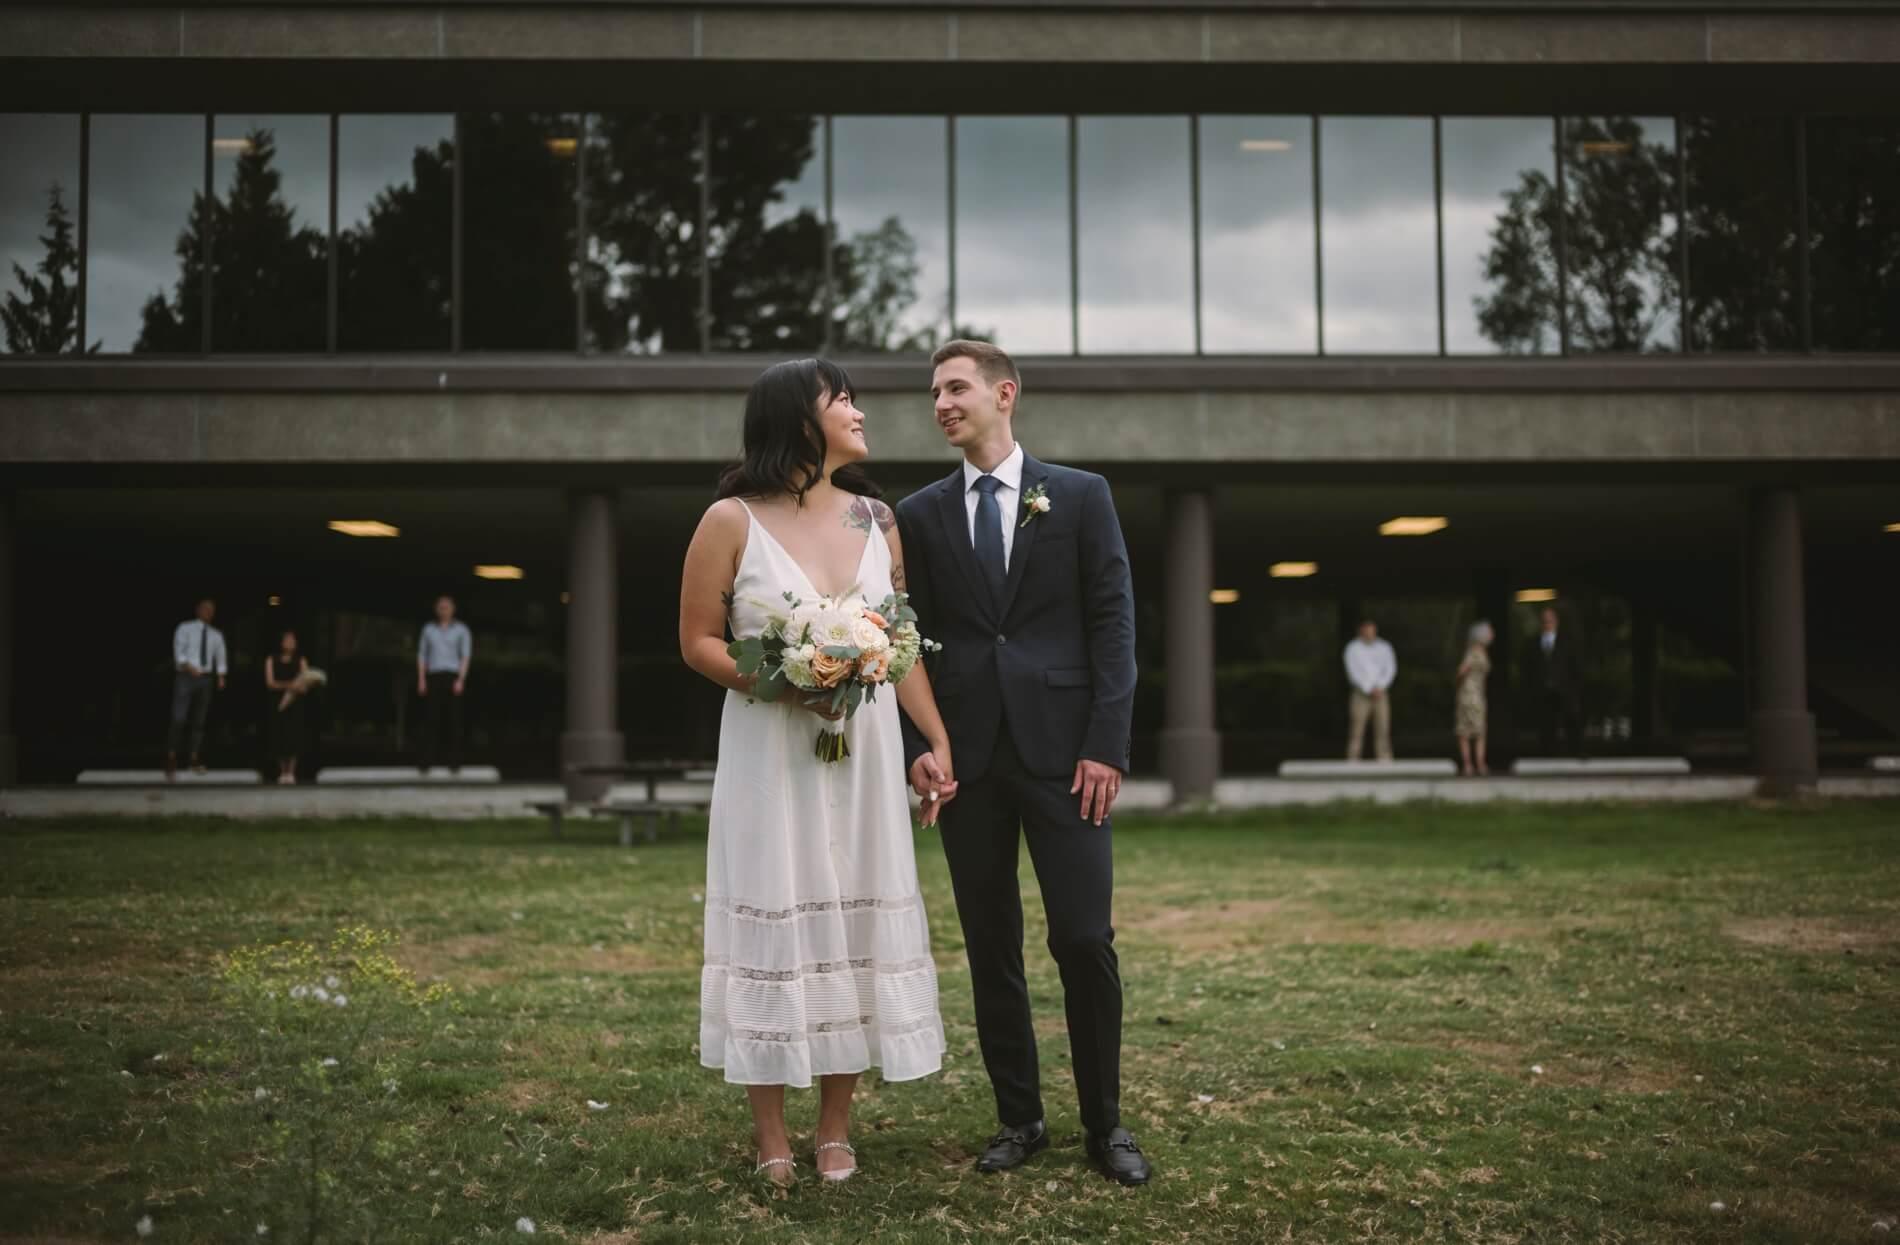 bellevue-courthouse-wedding-kyle-larson